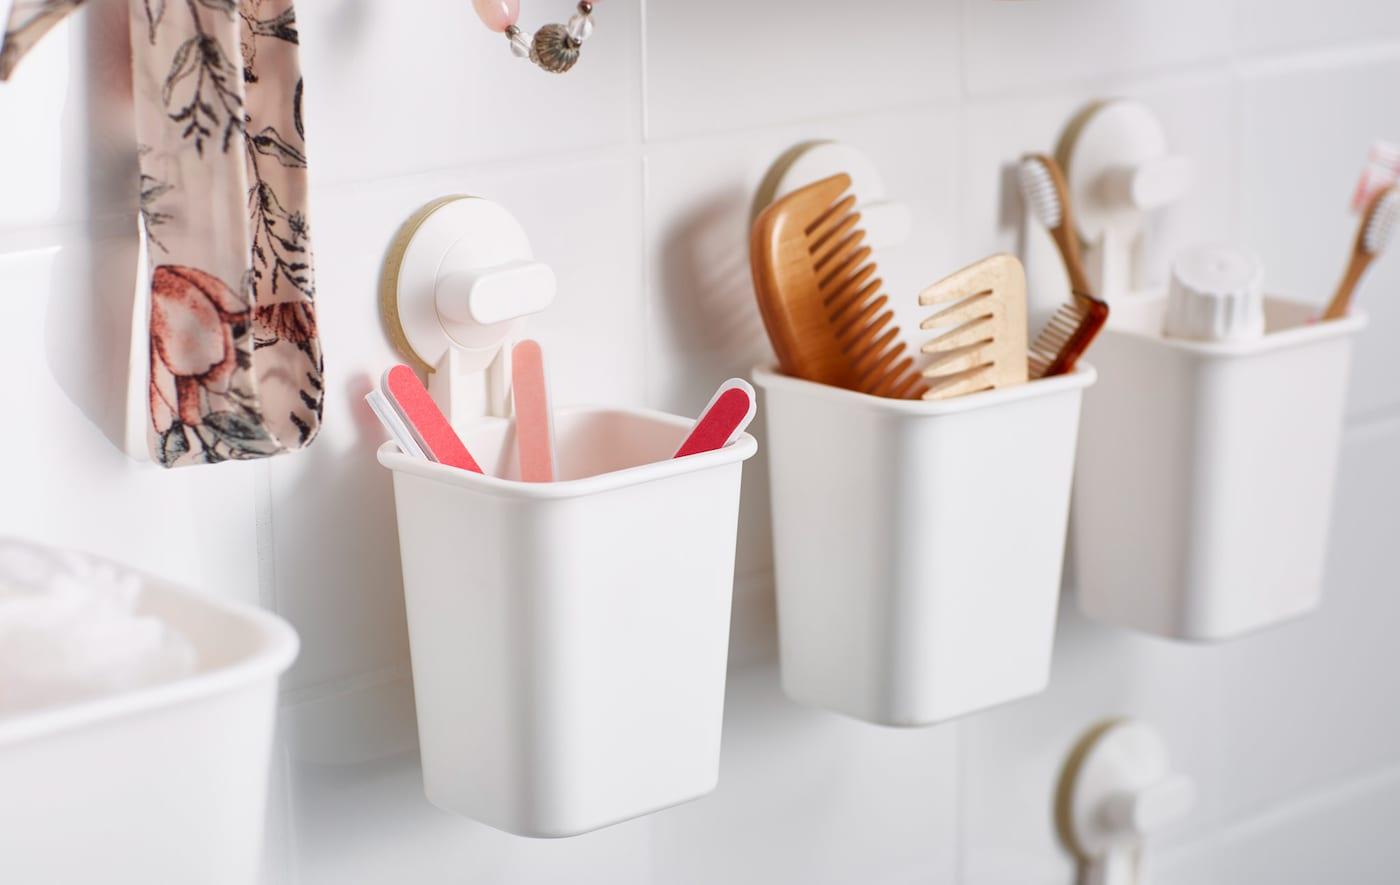 Buy Mirror, Bath Towel, Shower Curtain Online Kuwait - IKEA